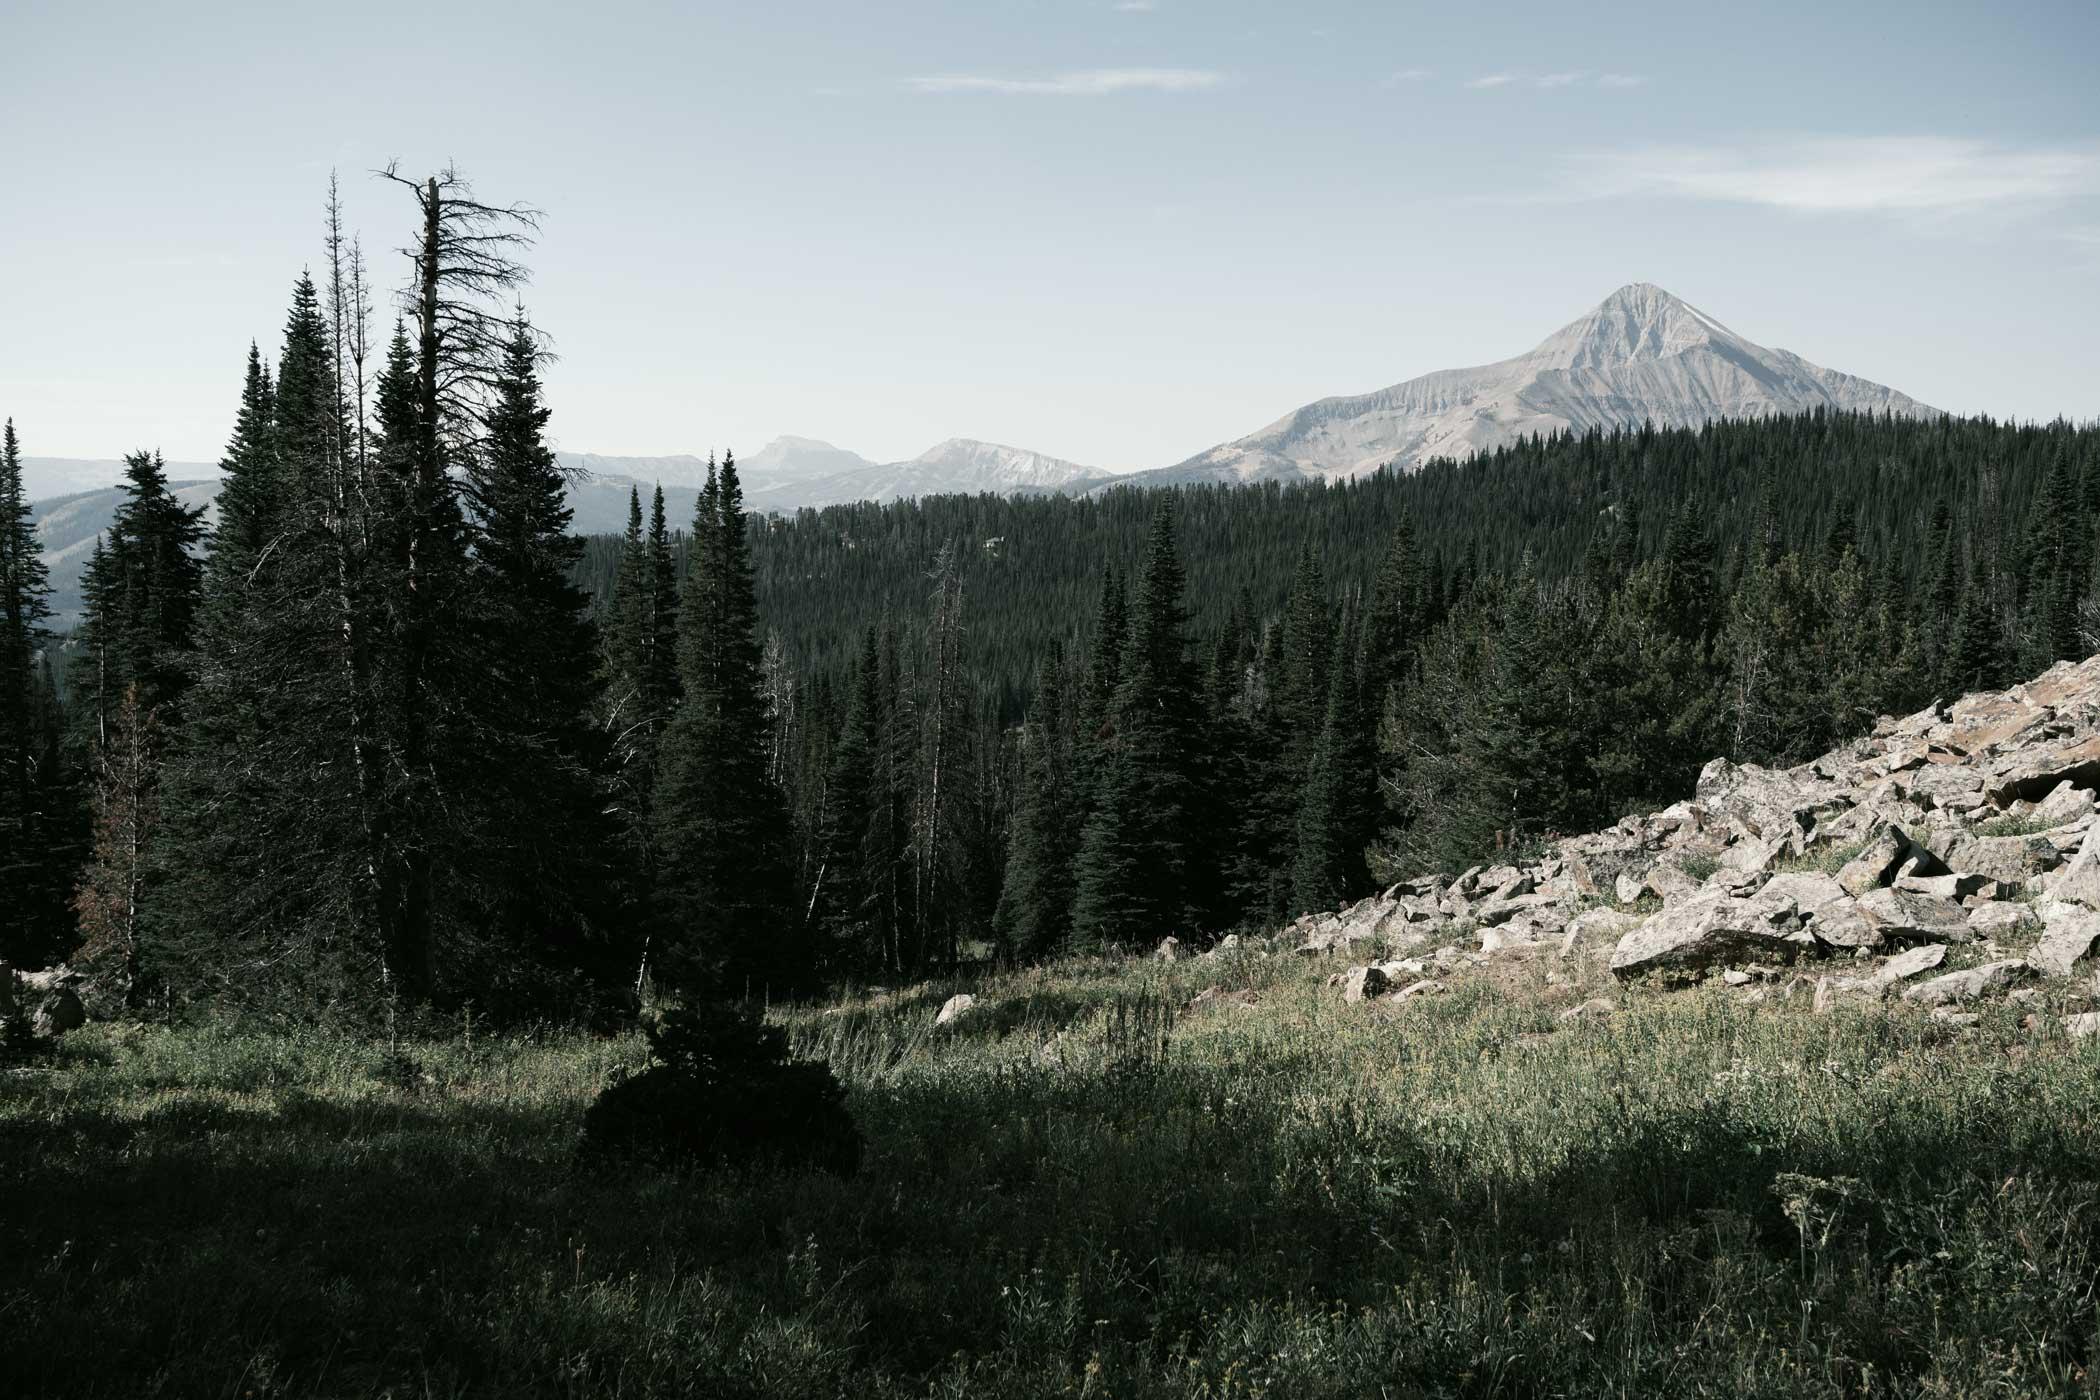 Image of Big Sky, Montana